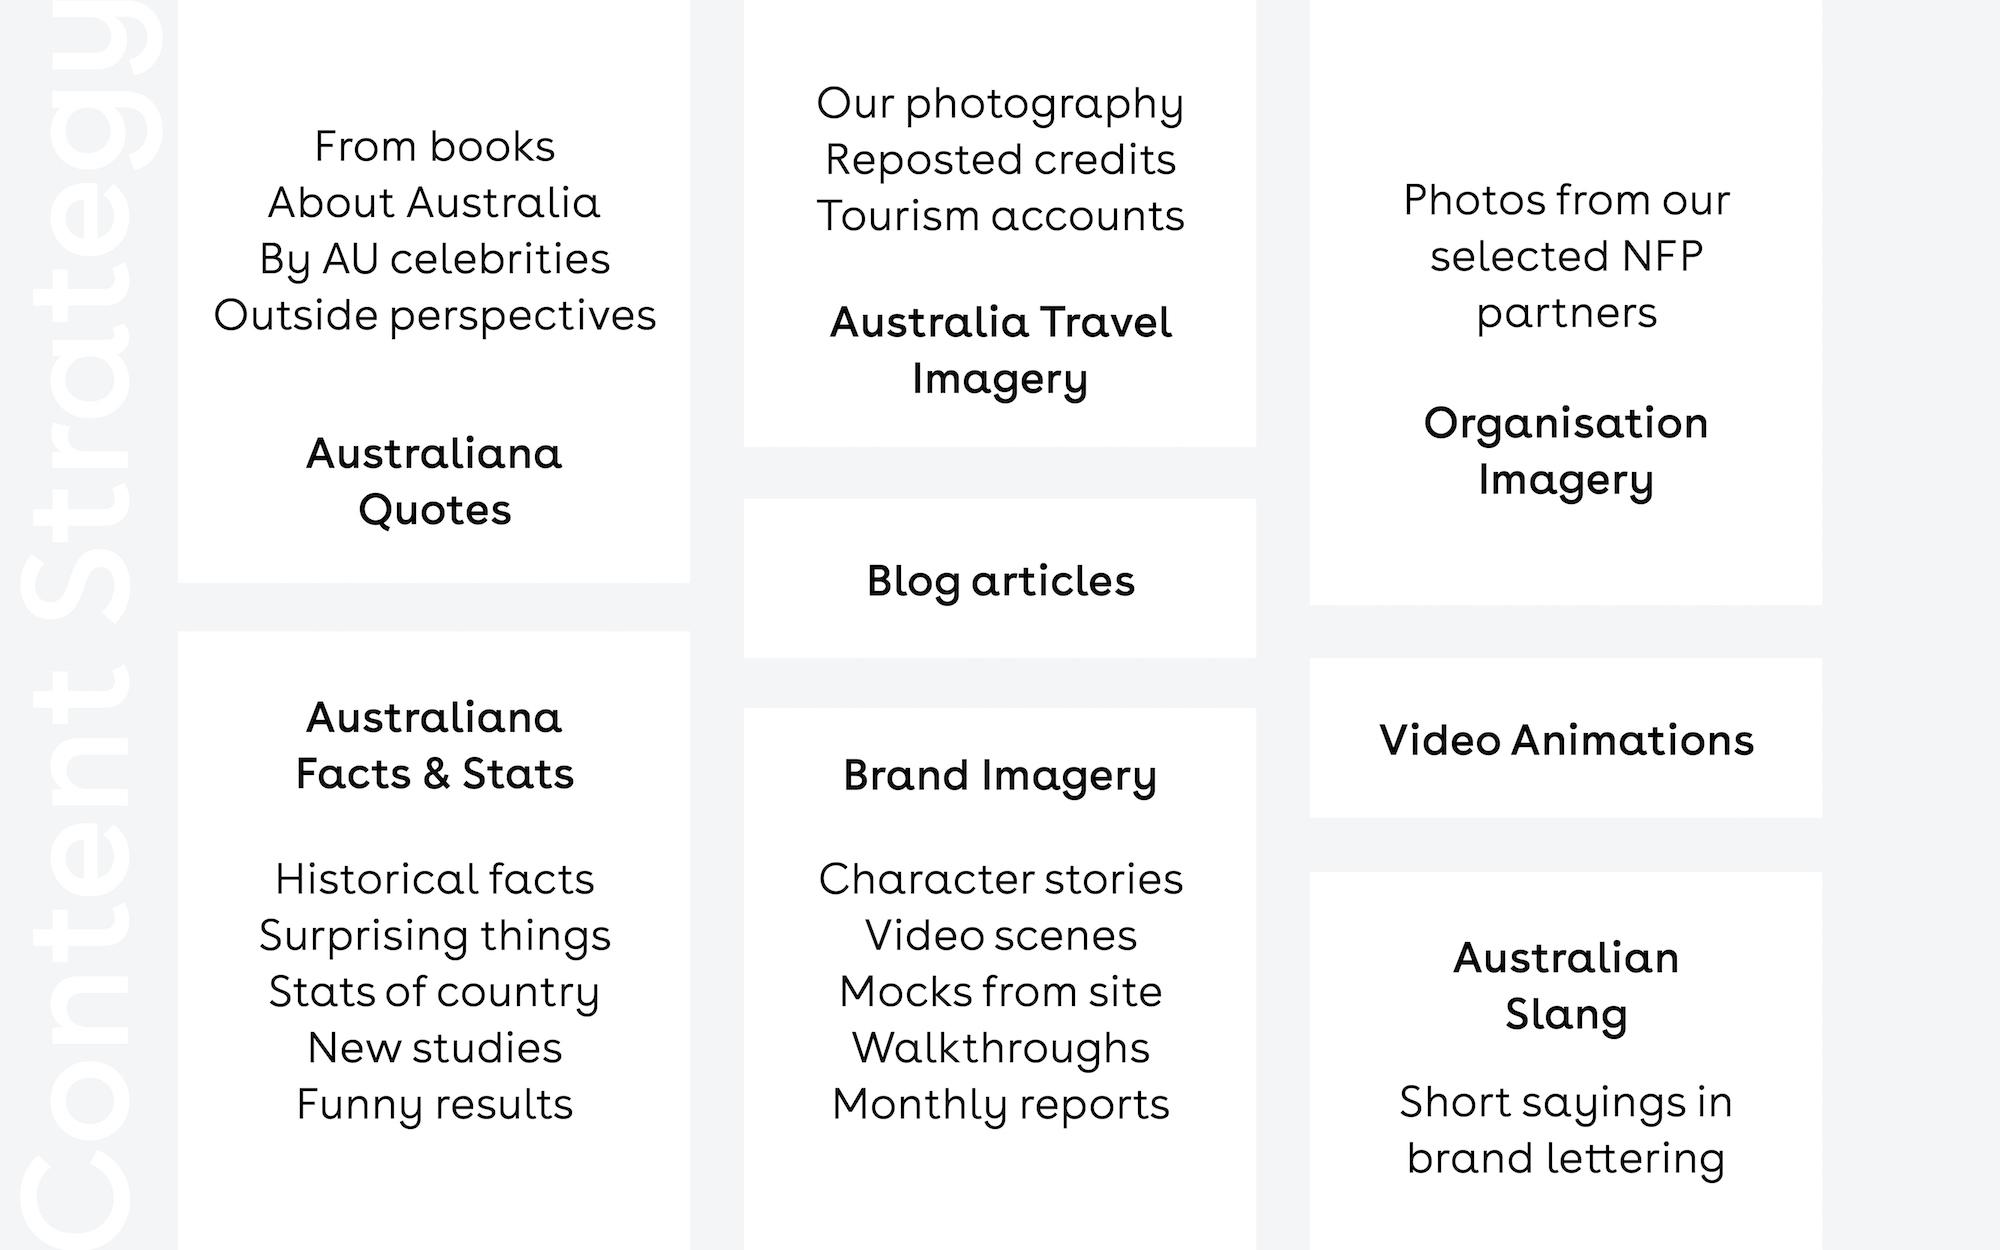 Kick the Tin Australia Search Engine Environmental Not for profit Charity Schools NGO Identity Division UI/UX Design Experience Design Human Lis Lisande Dingjan